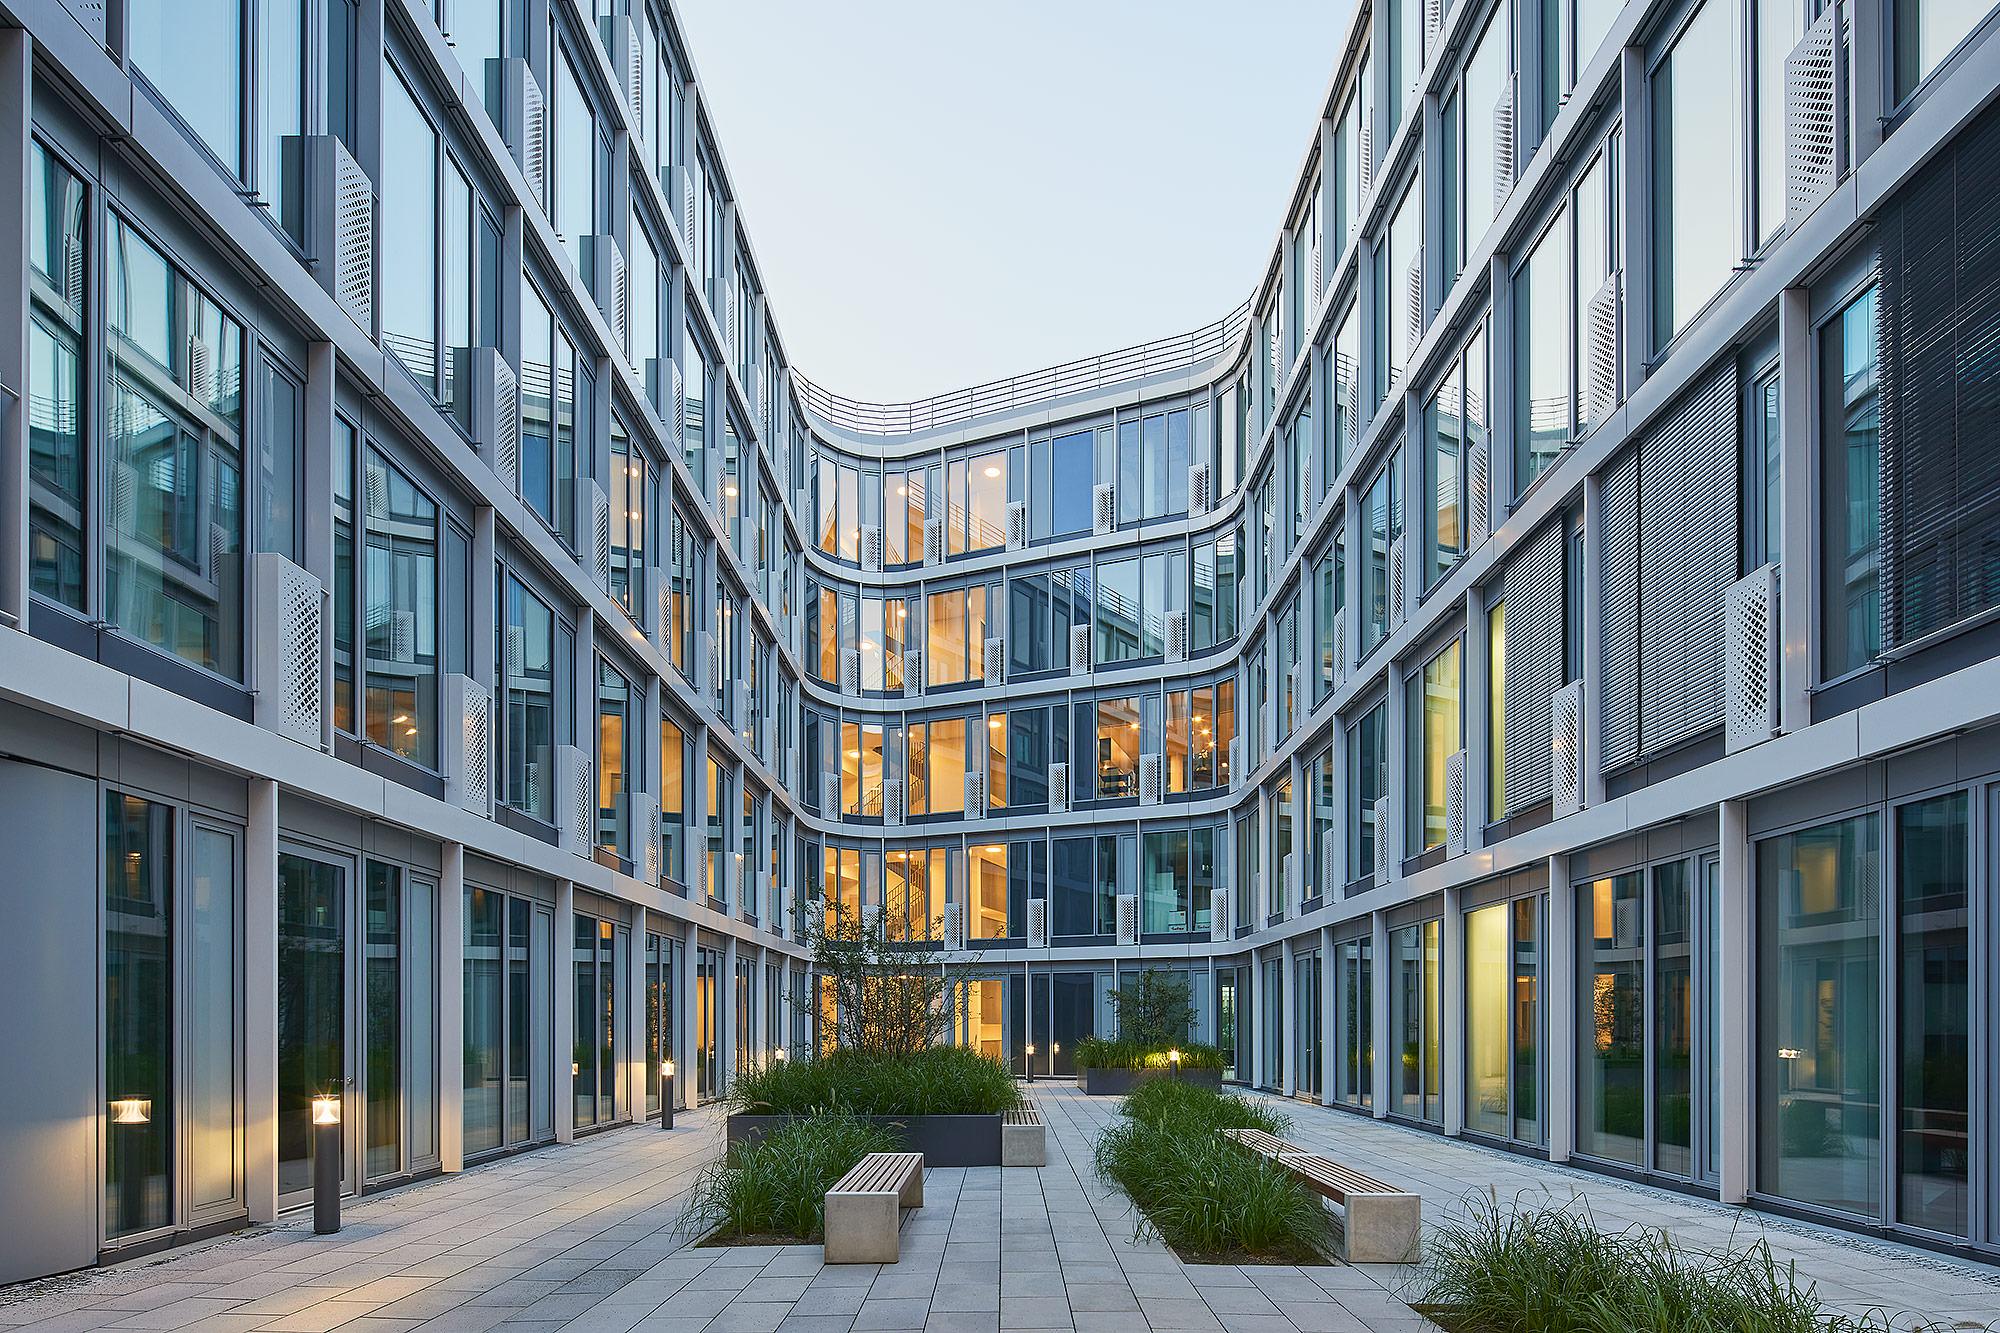 Infinity Offfice, Düsseldorf @ Philip Kistner